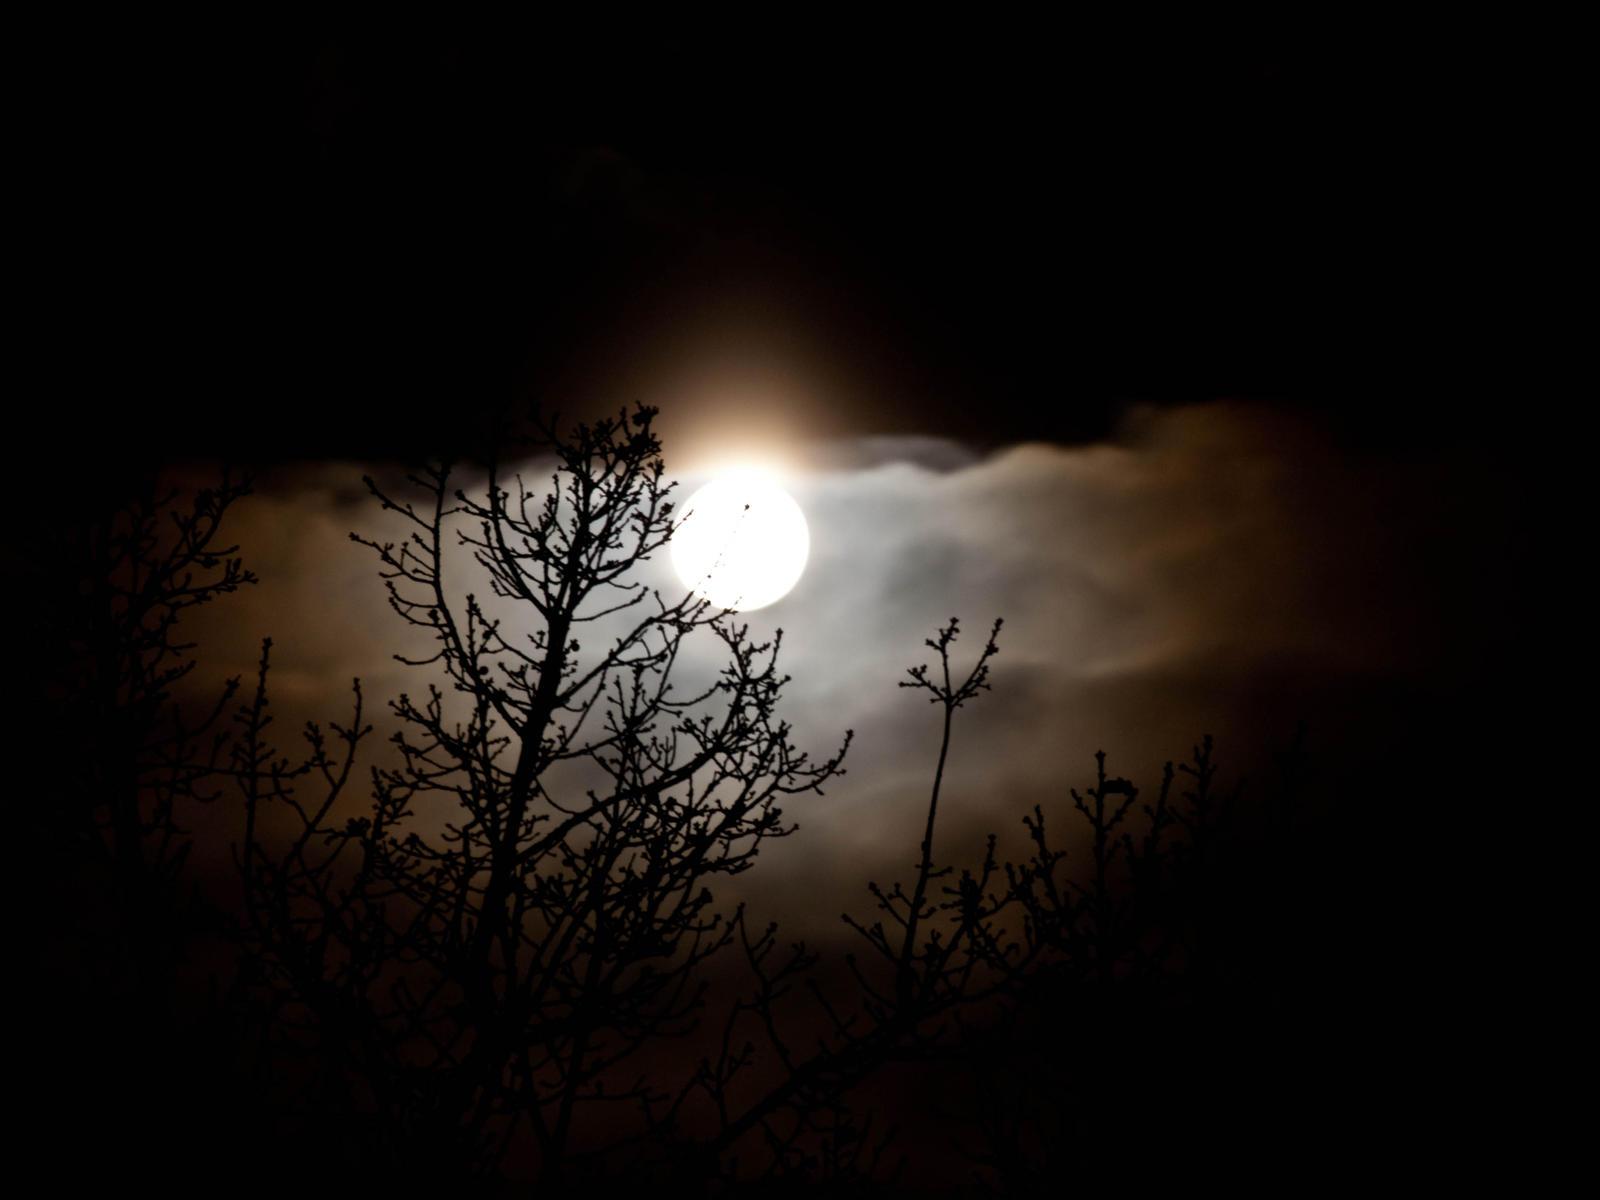 Mysterious Moon by sandrability